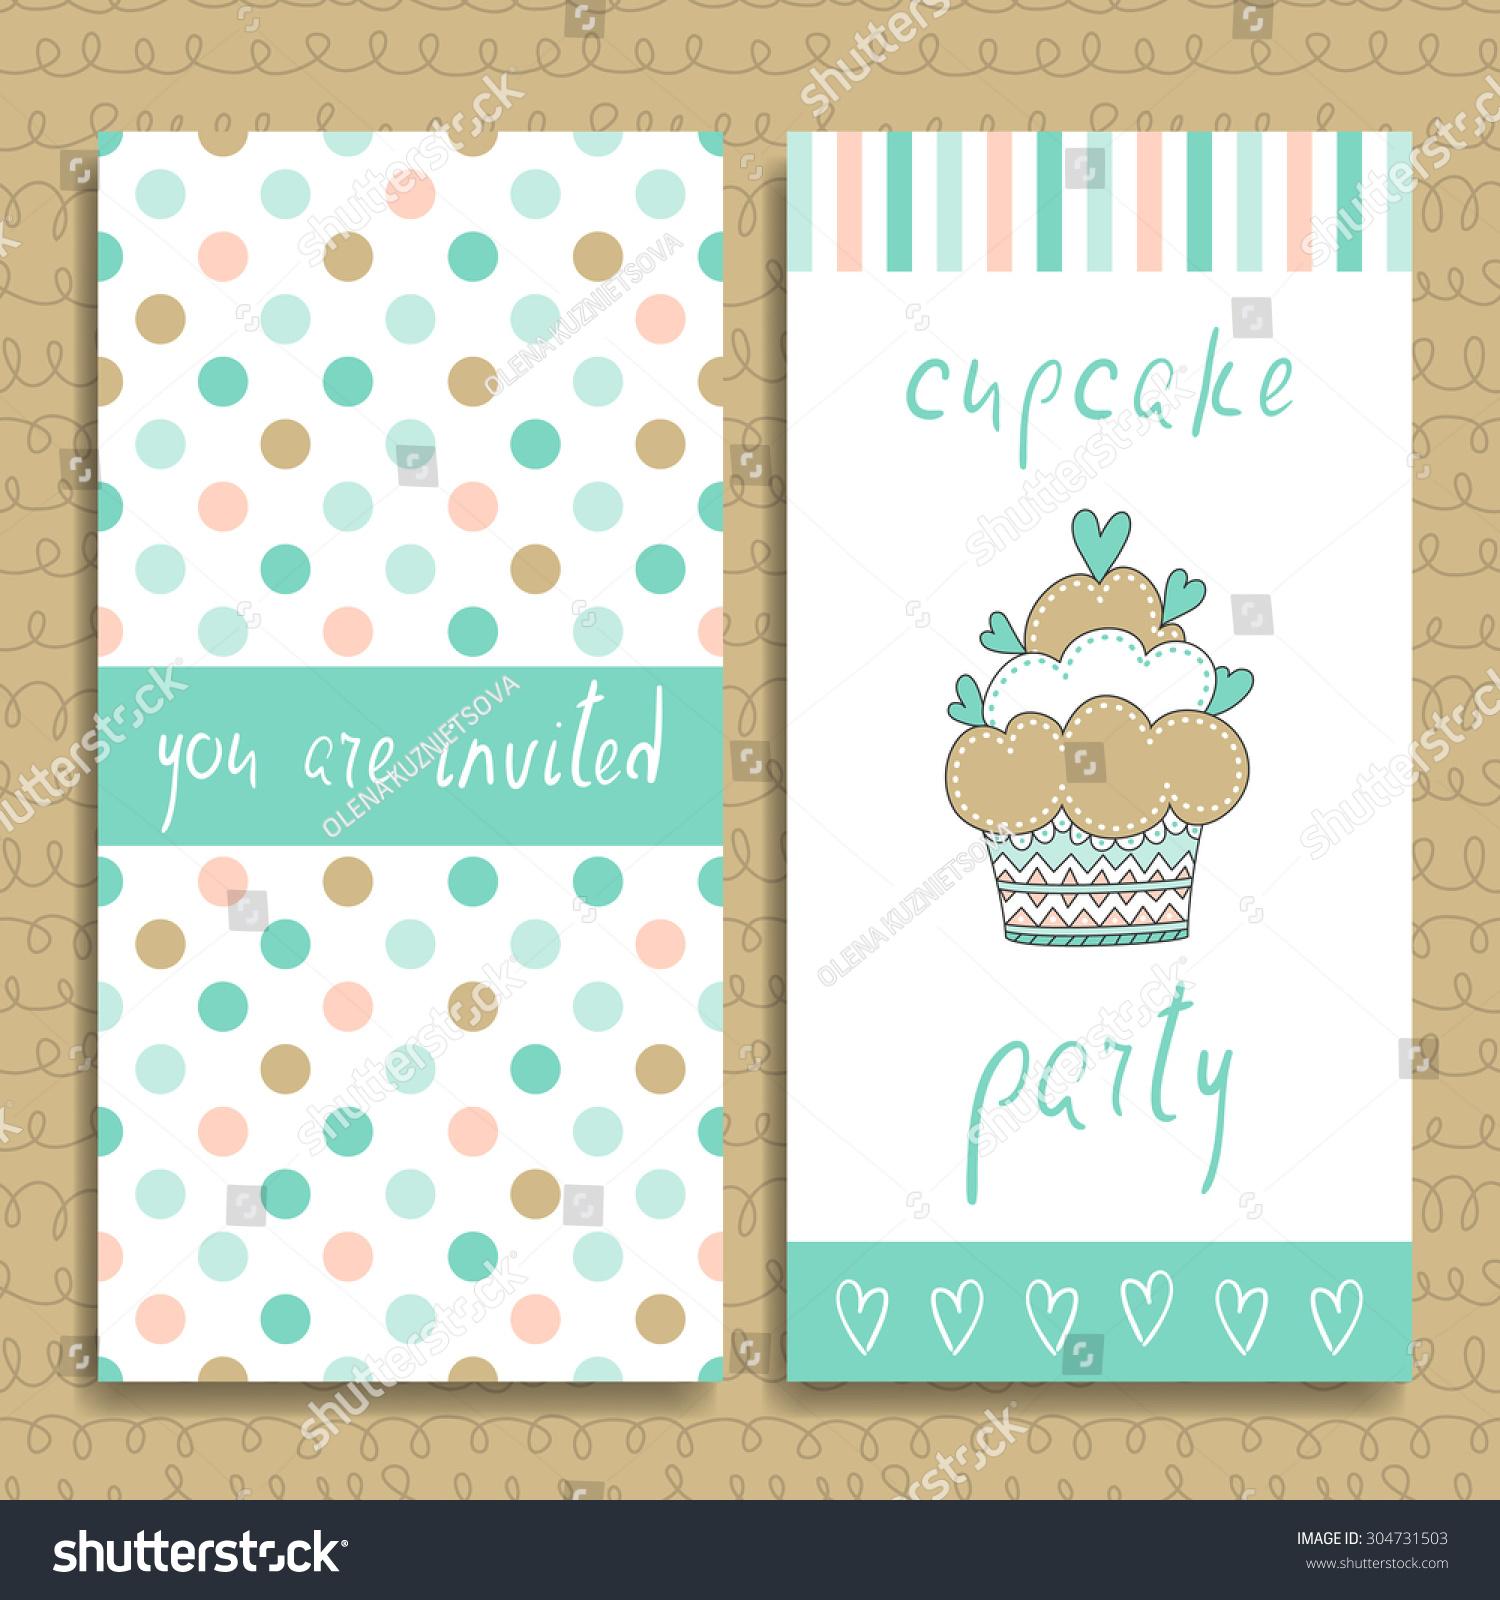 Cupcake Party Invitation Card Vector Illustration Stock Vector HD ...